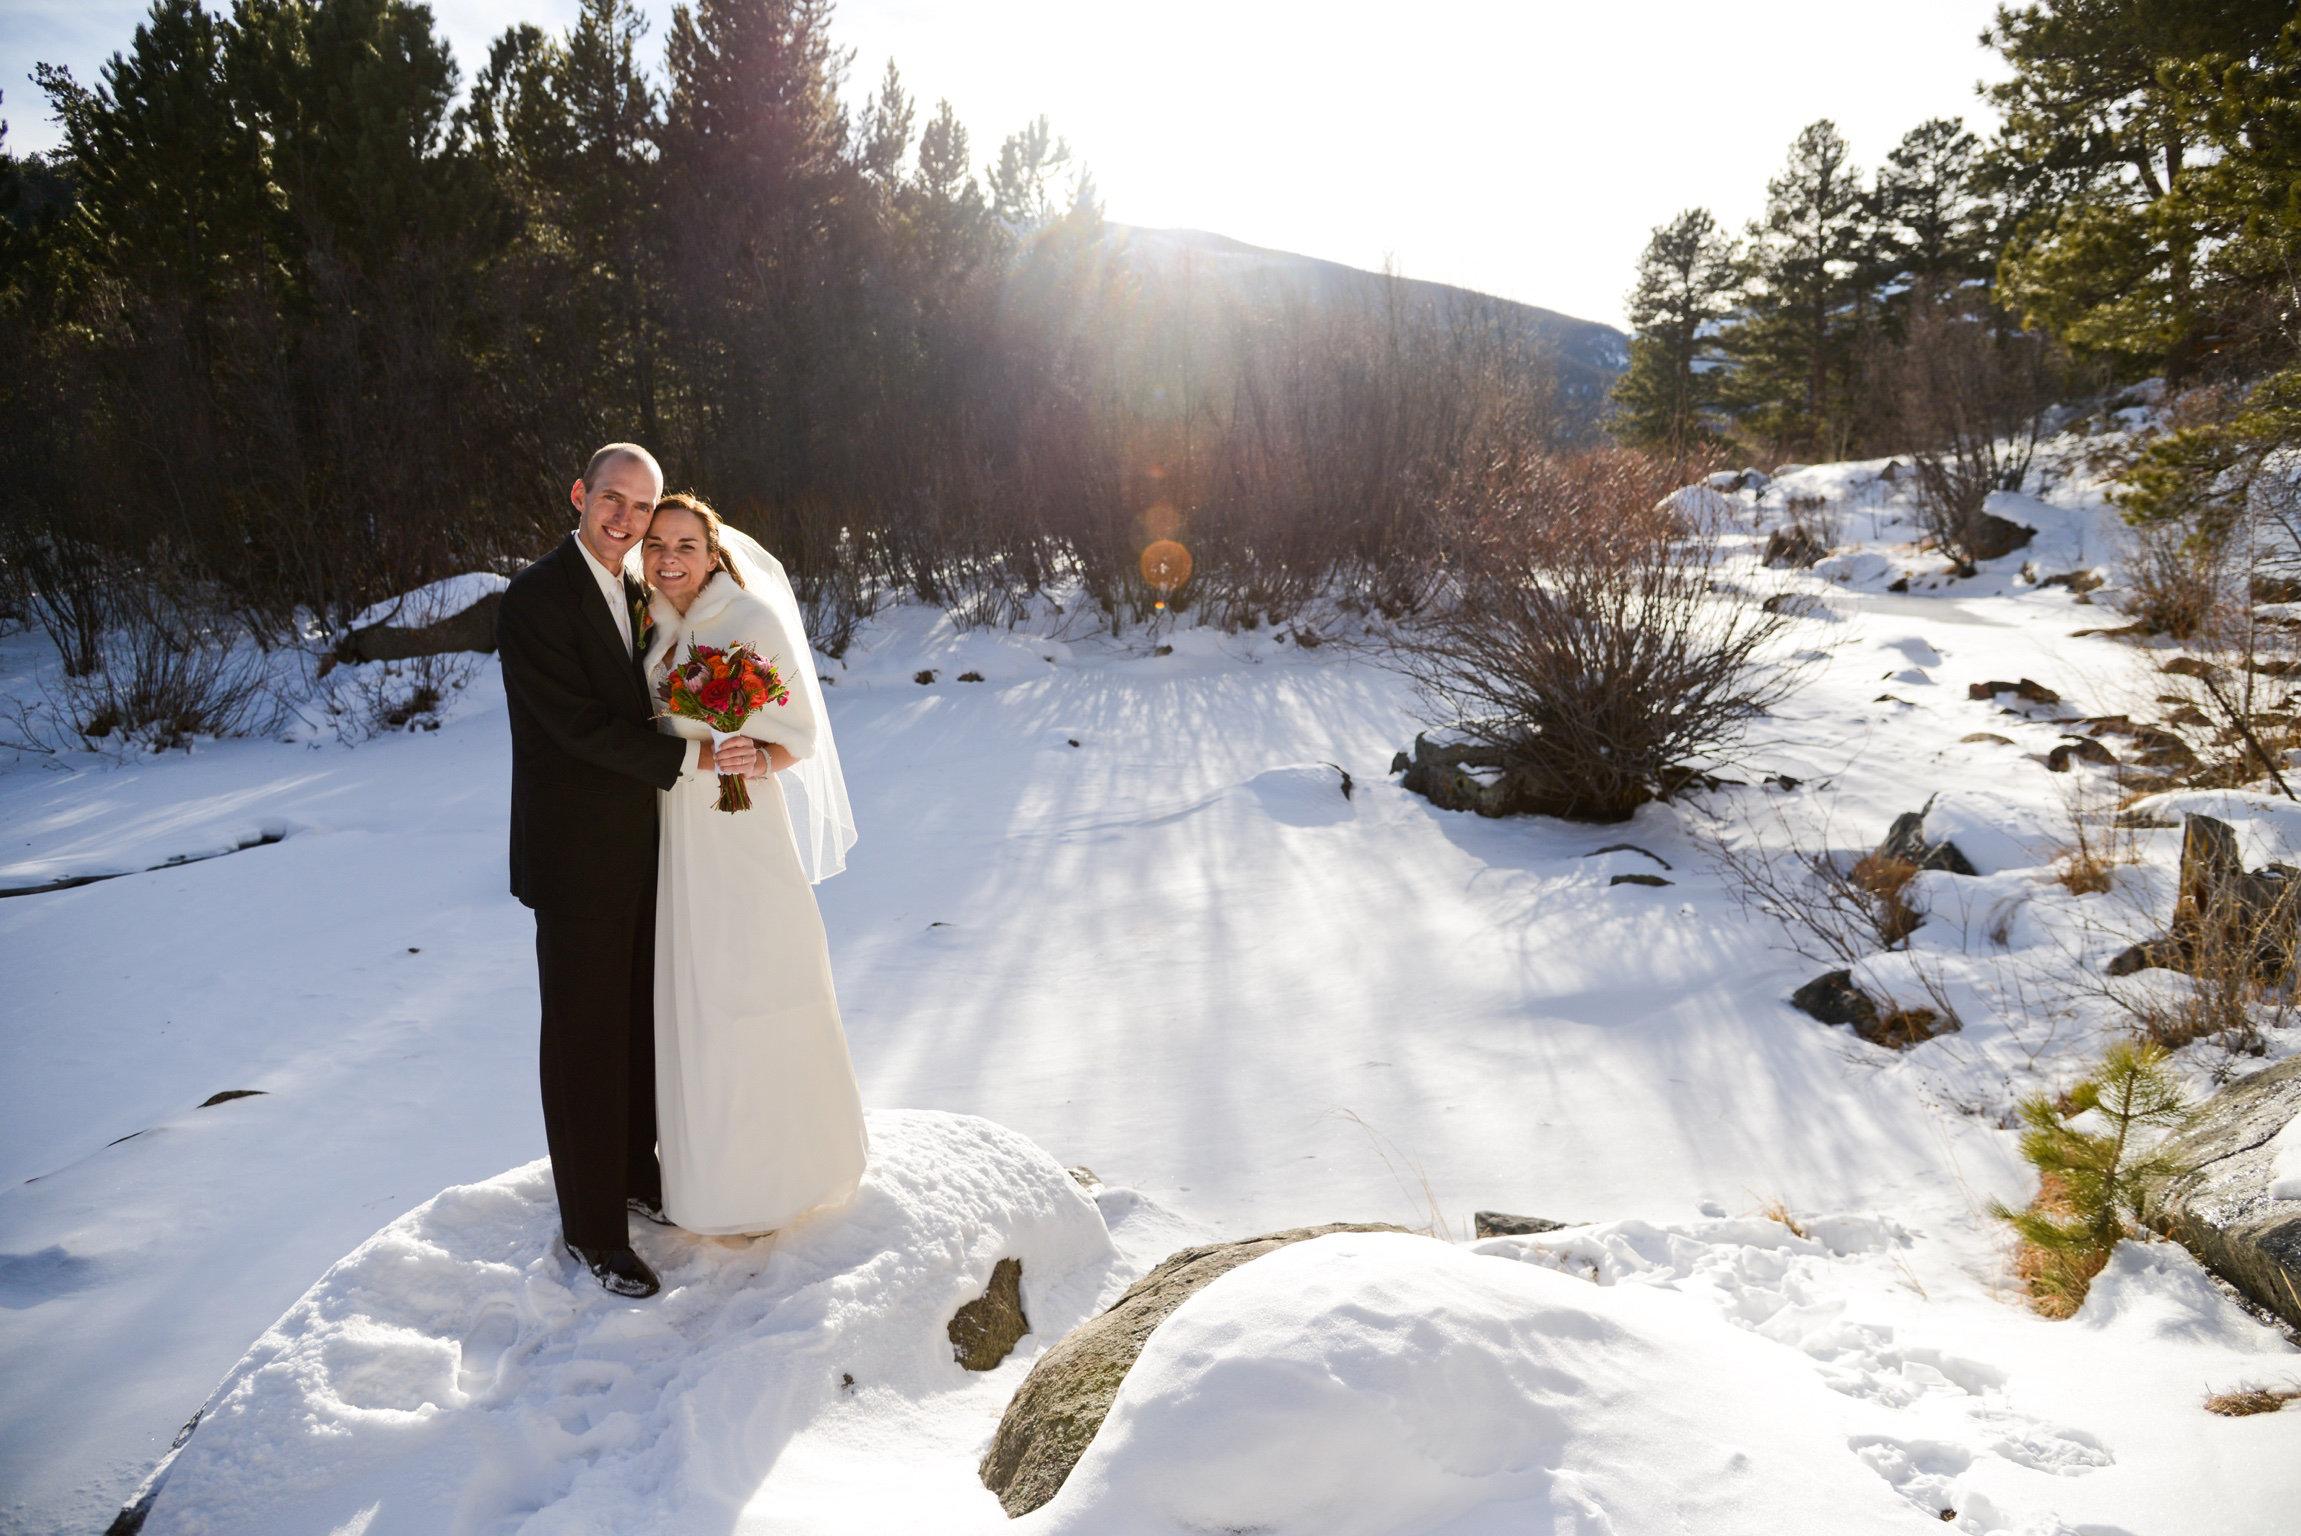 We were married in Colorado in 2012